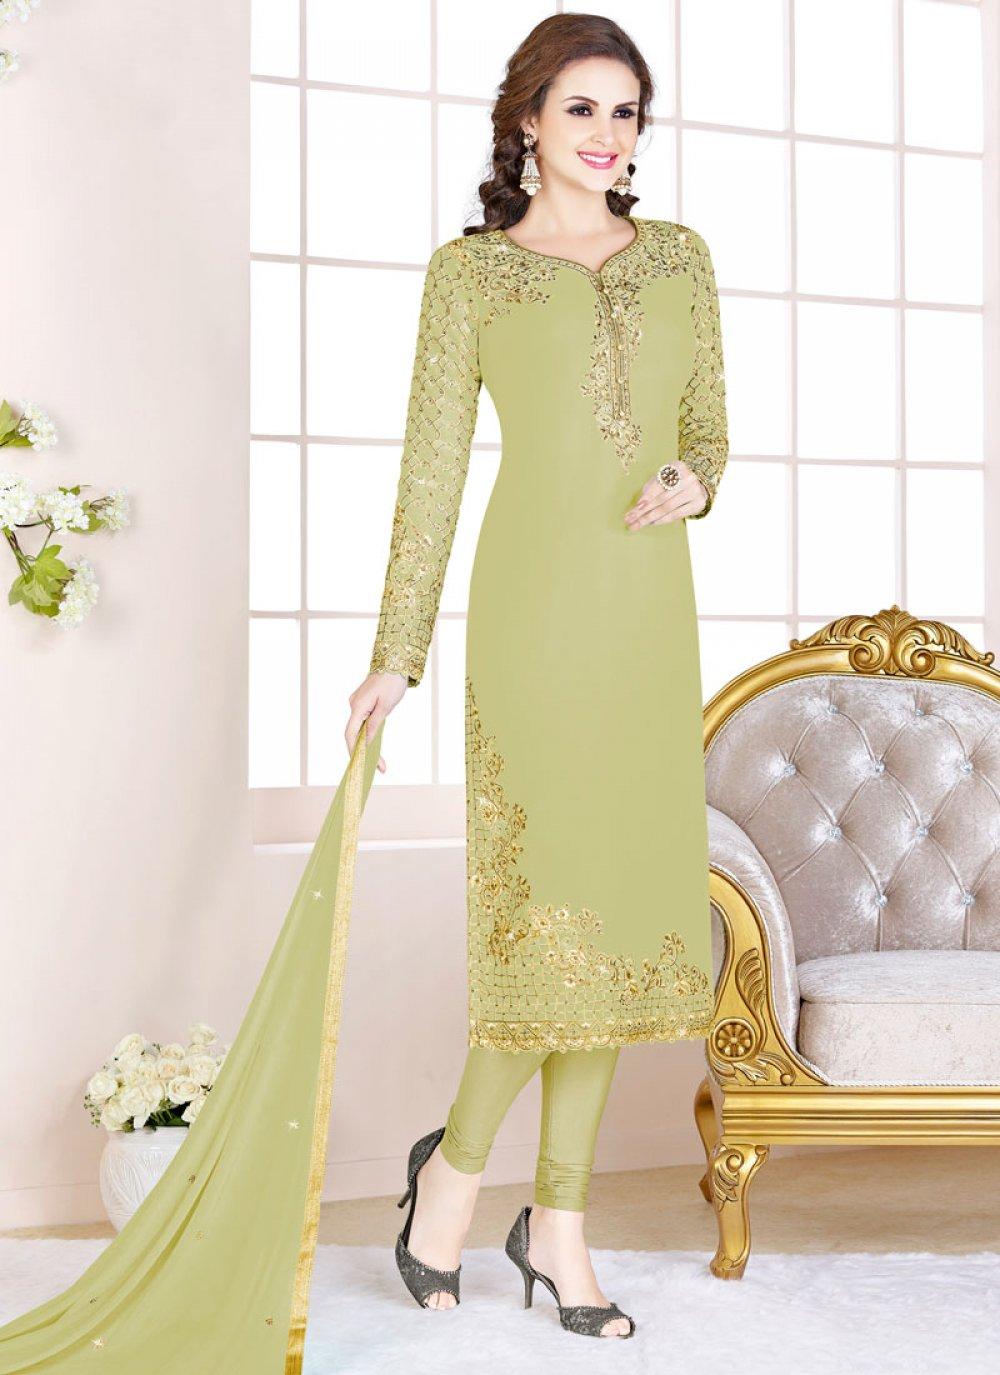 Georgette Embroidered Churidar Salwar Suit in Green